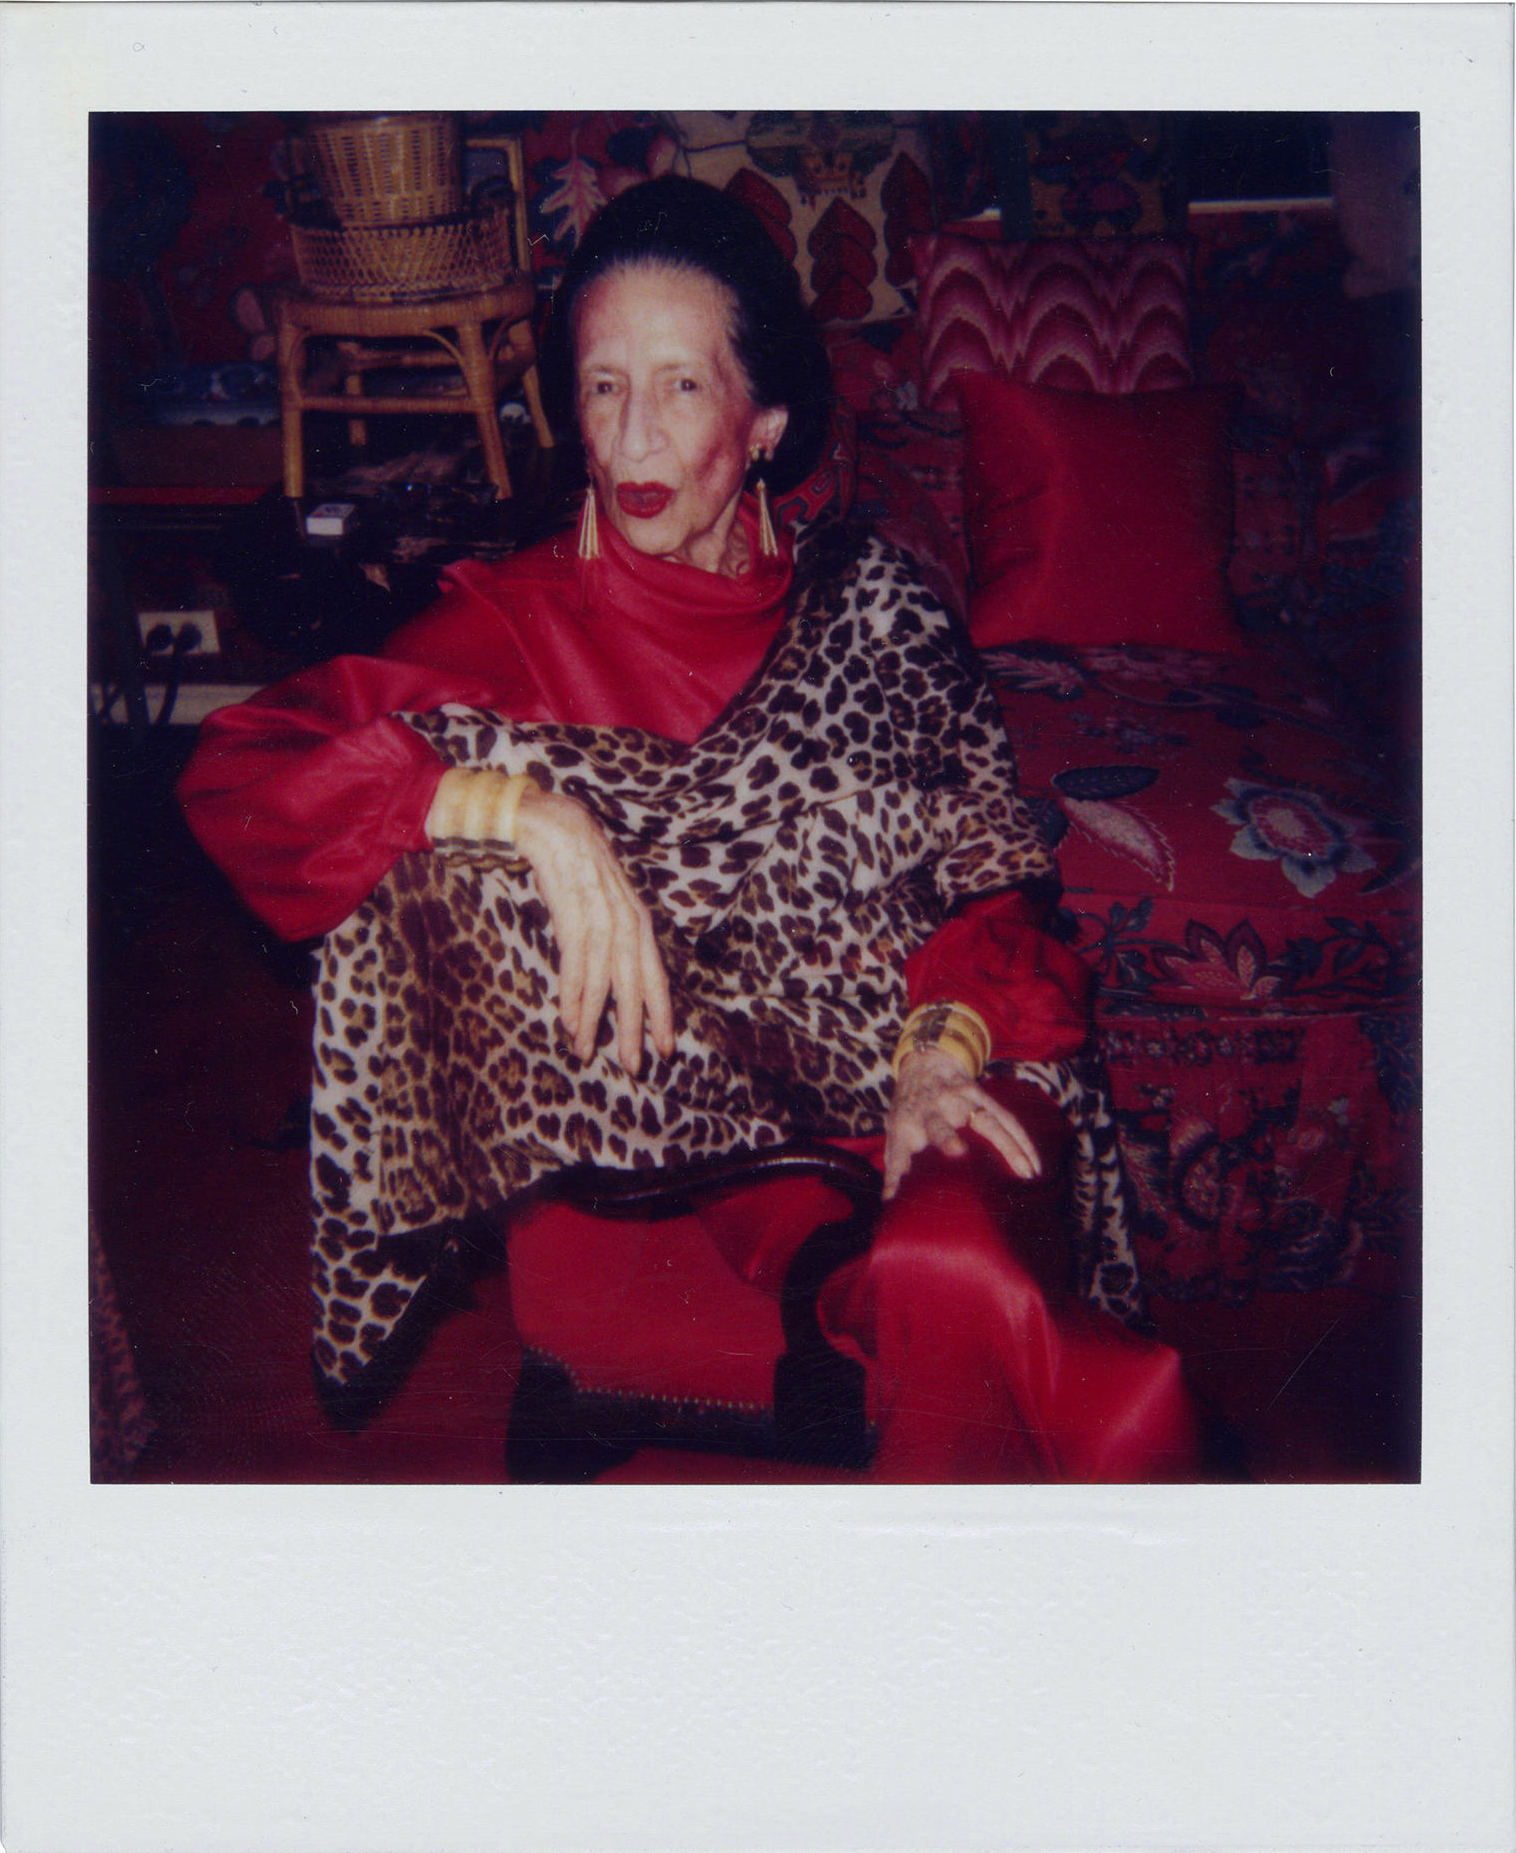 Diana Vreeland polaroid by Andy Warhol, circa 1982